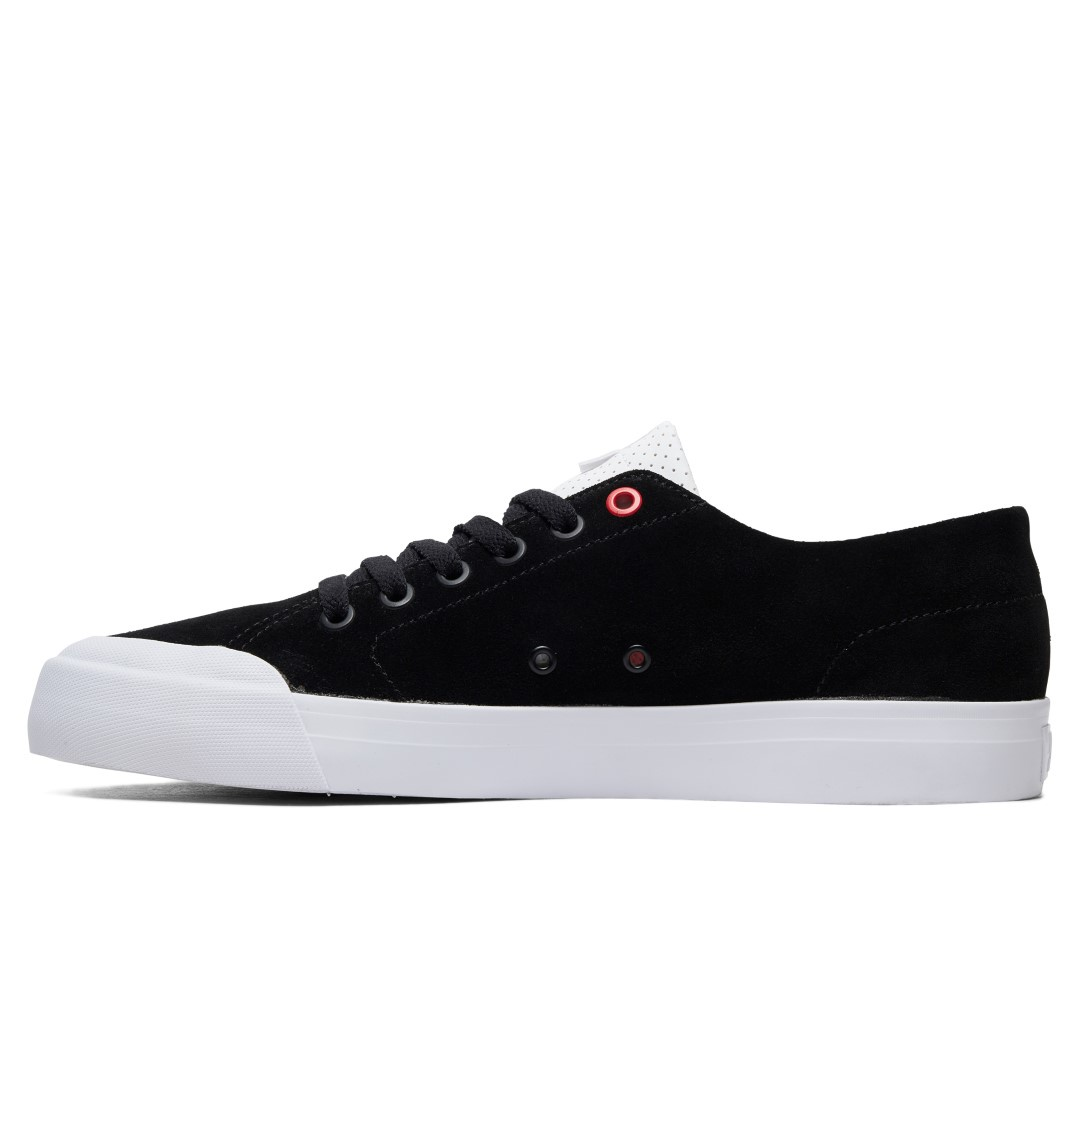 все цены на Кеды DC Shoes онлайн